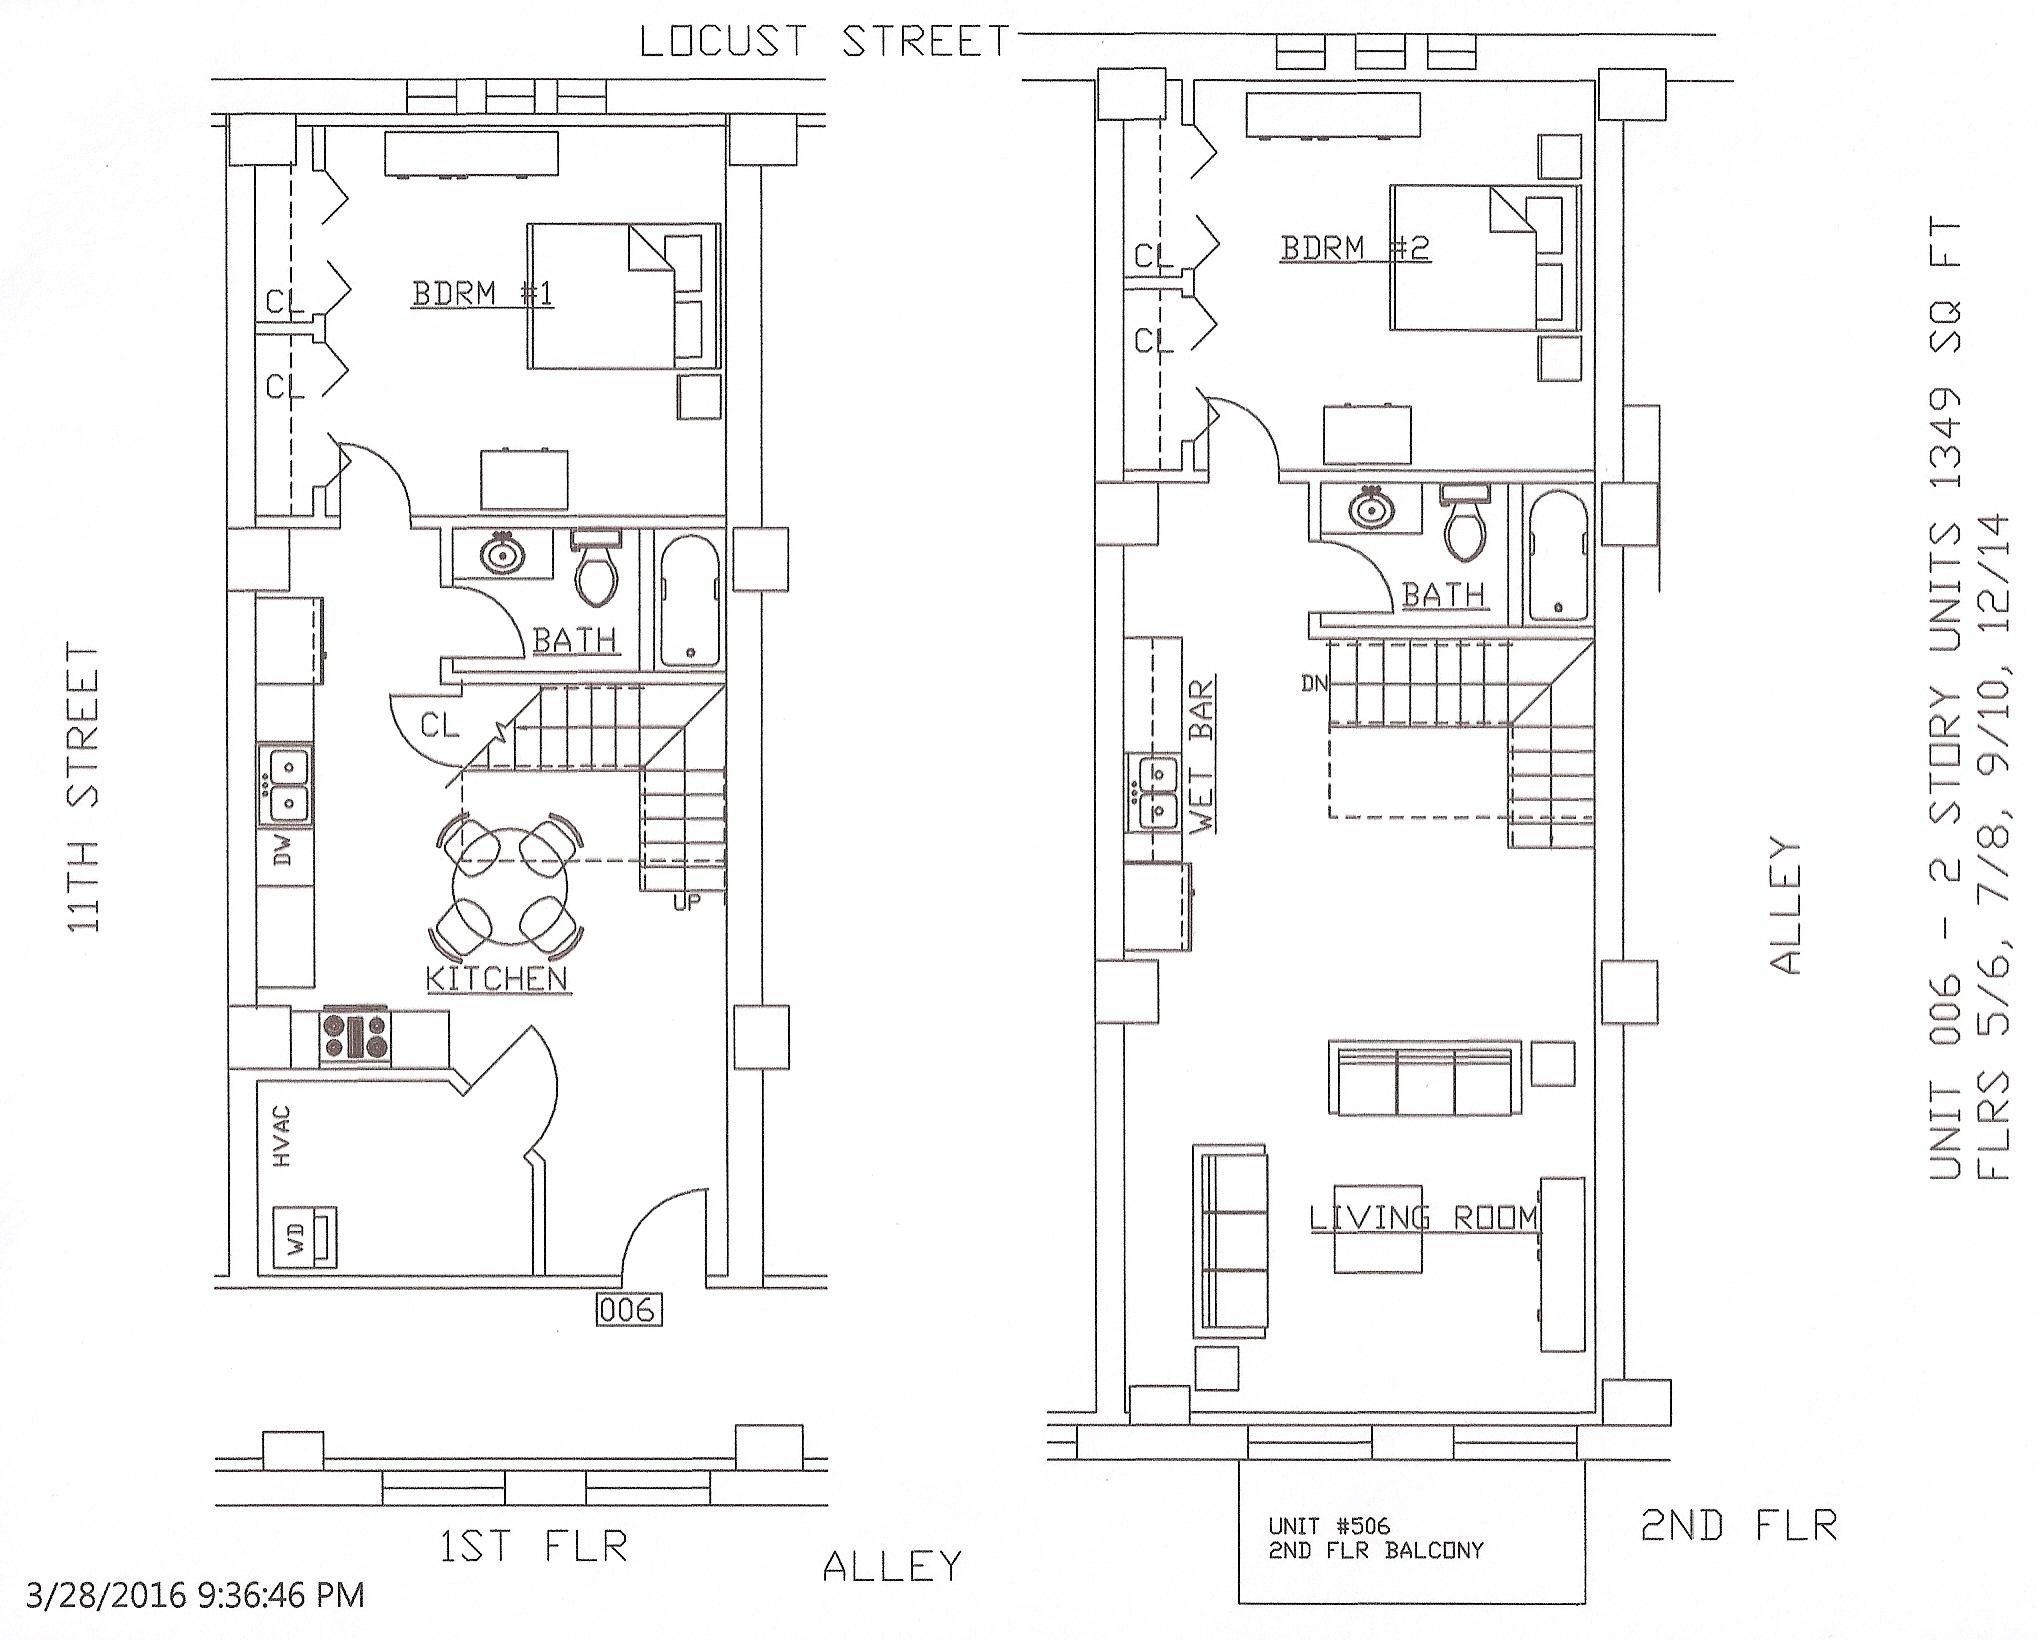 Unit 06, 1349 Square Feet